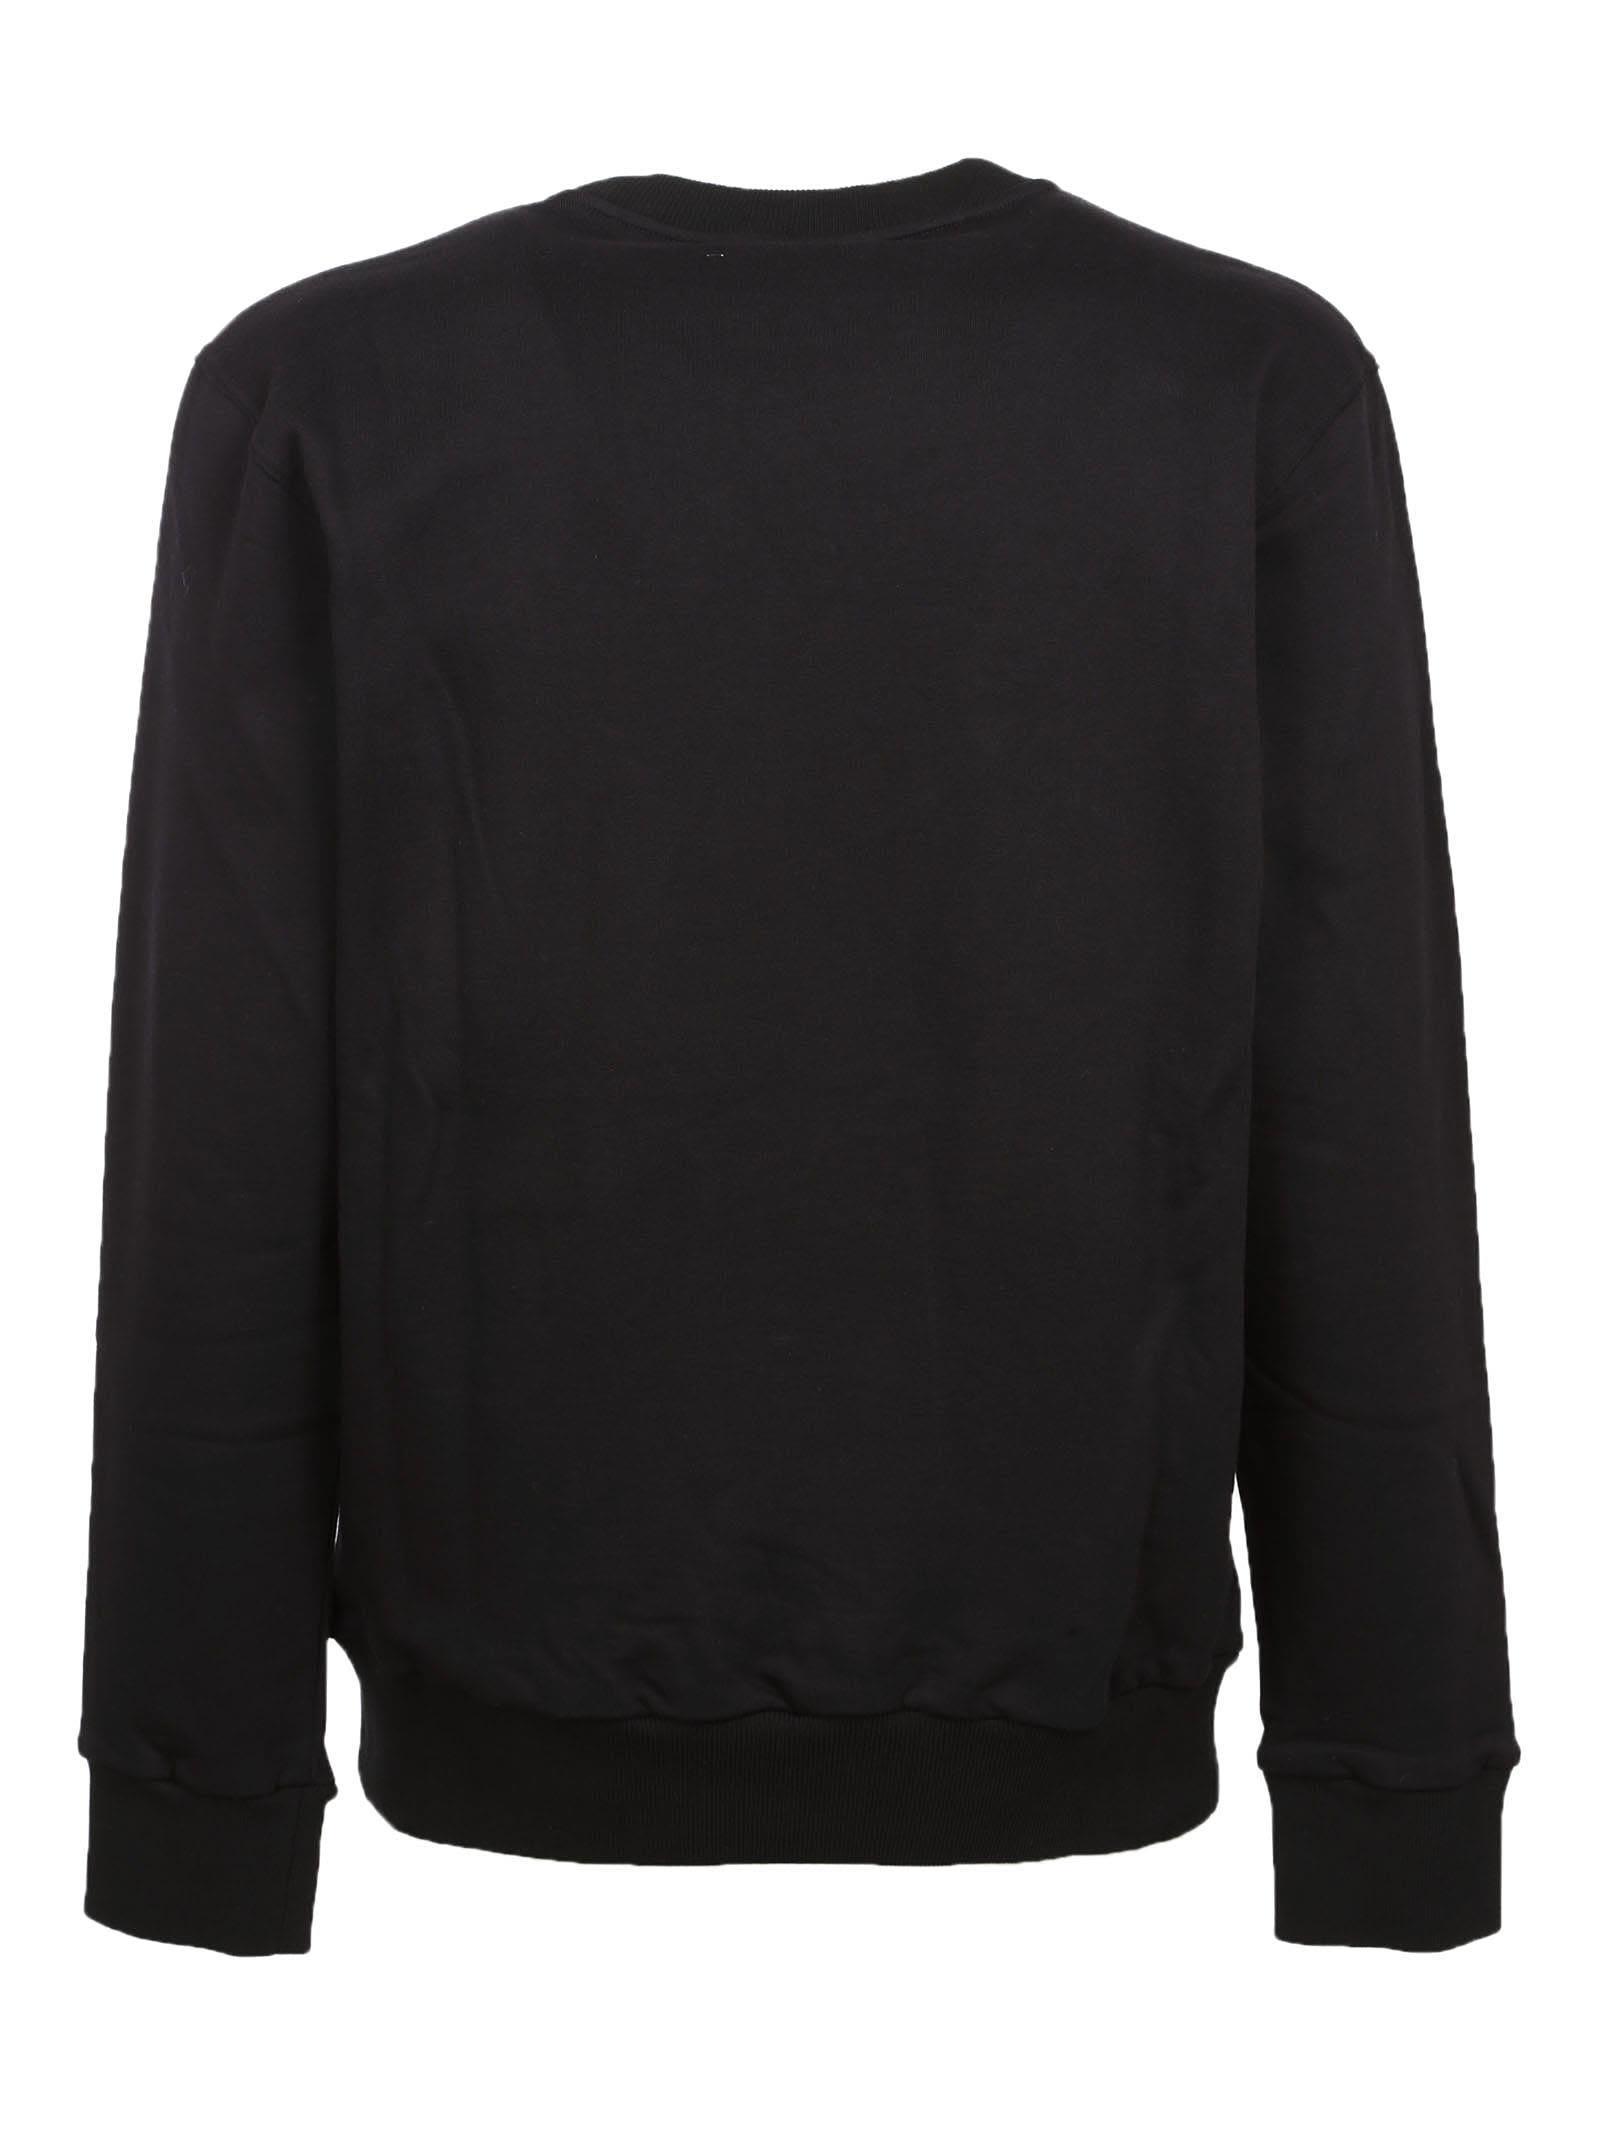 Lanvin Lobster Print Sweatshirt